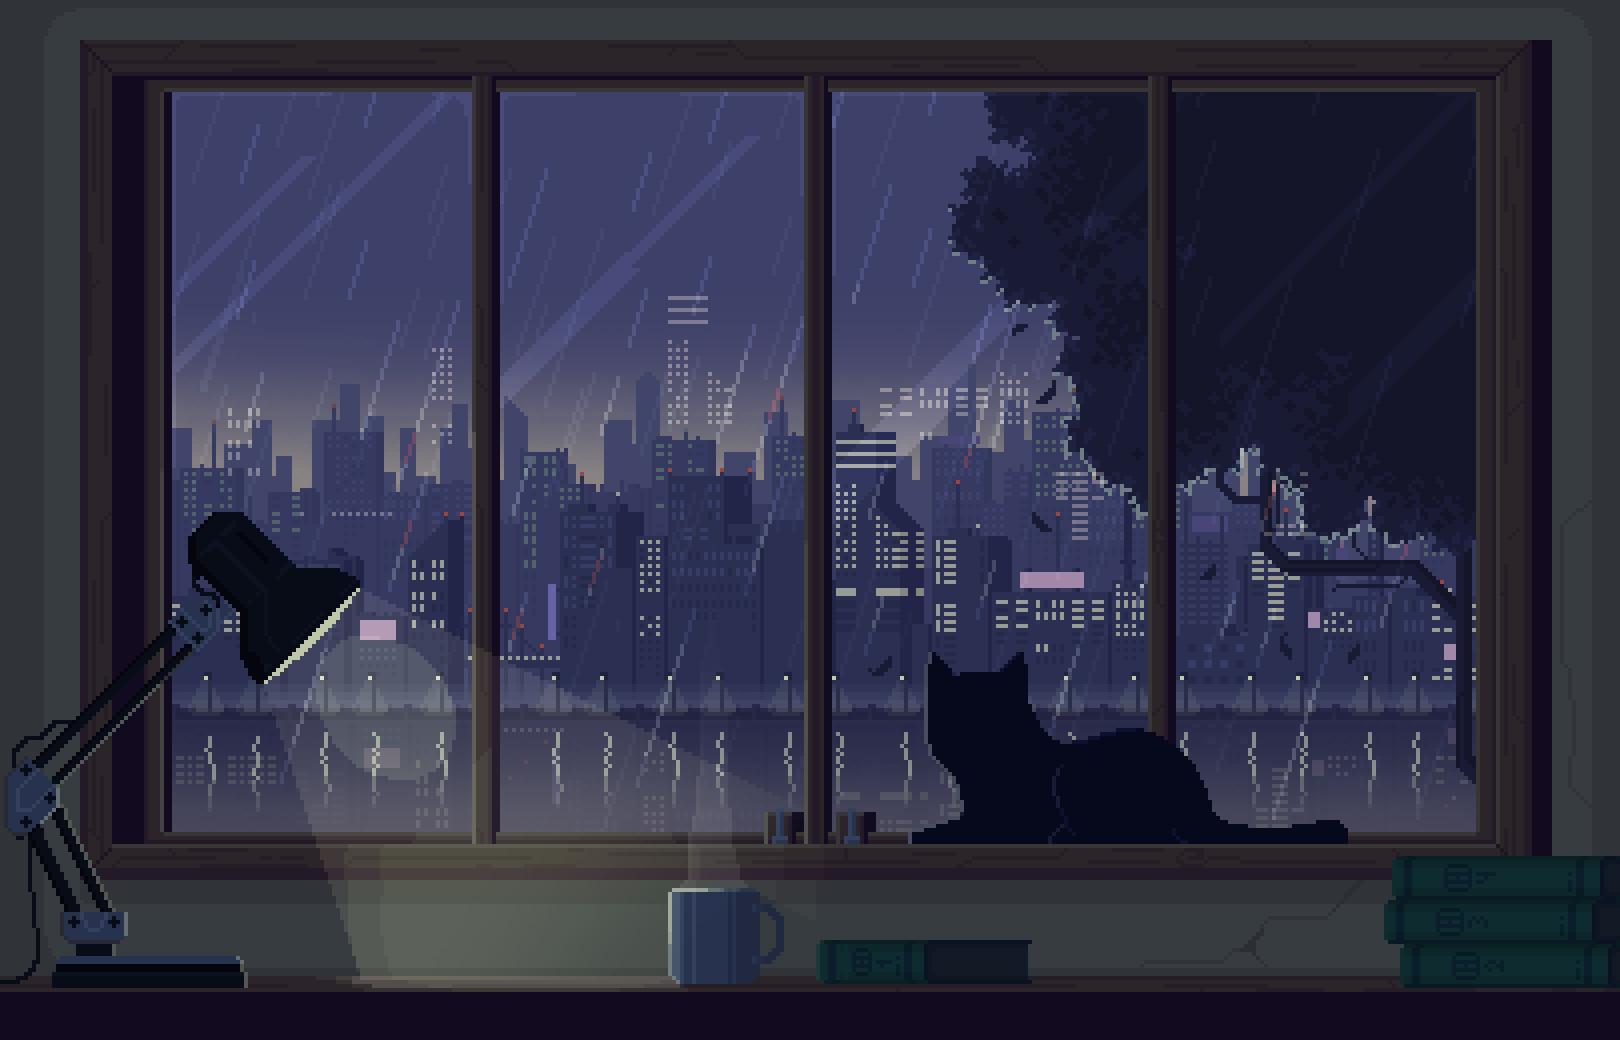 Anime Aesthetic Desktop Wallpaper Posted By Michelle Walker